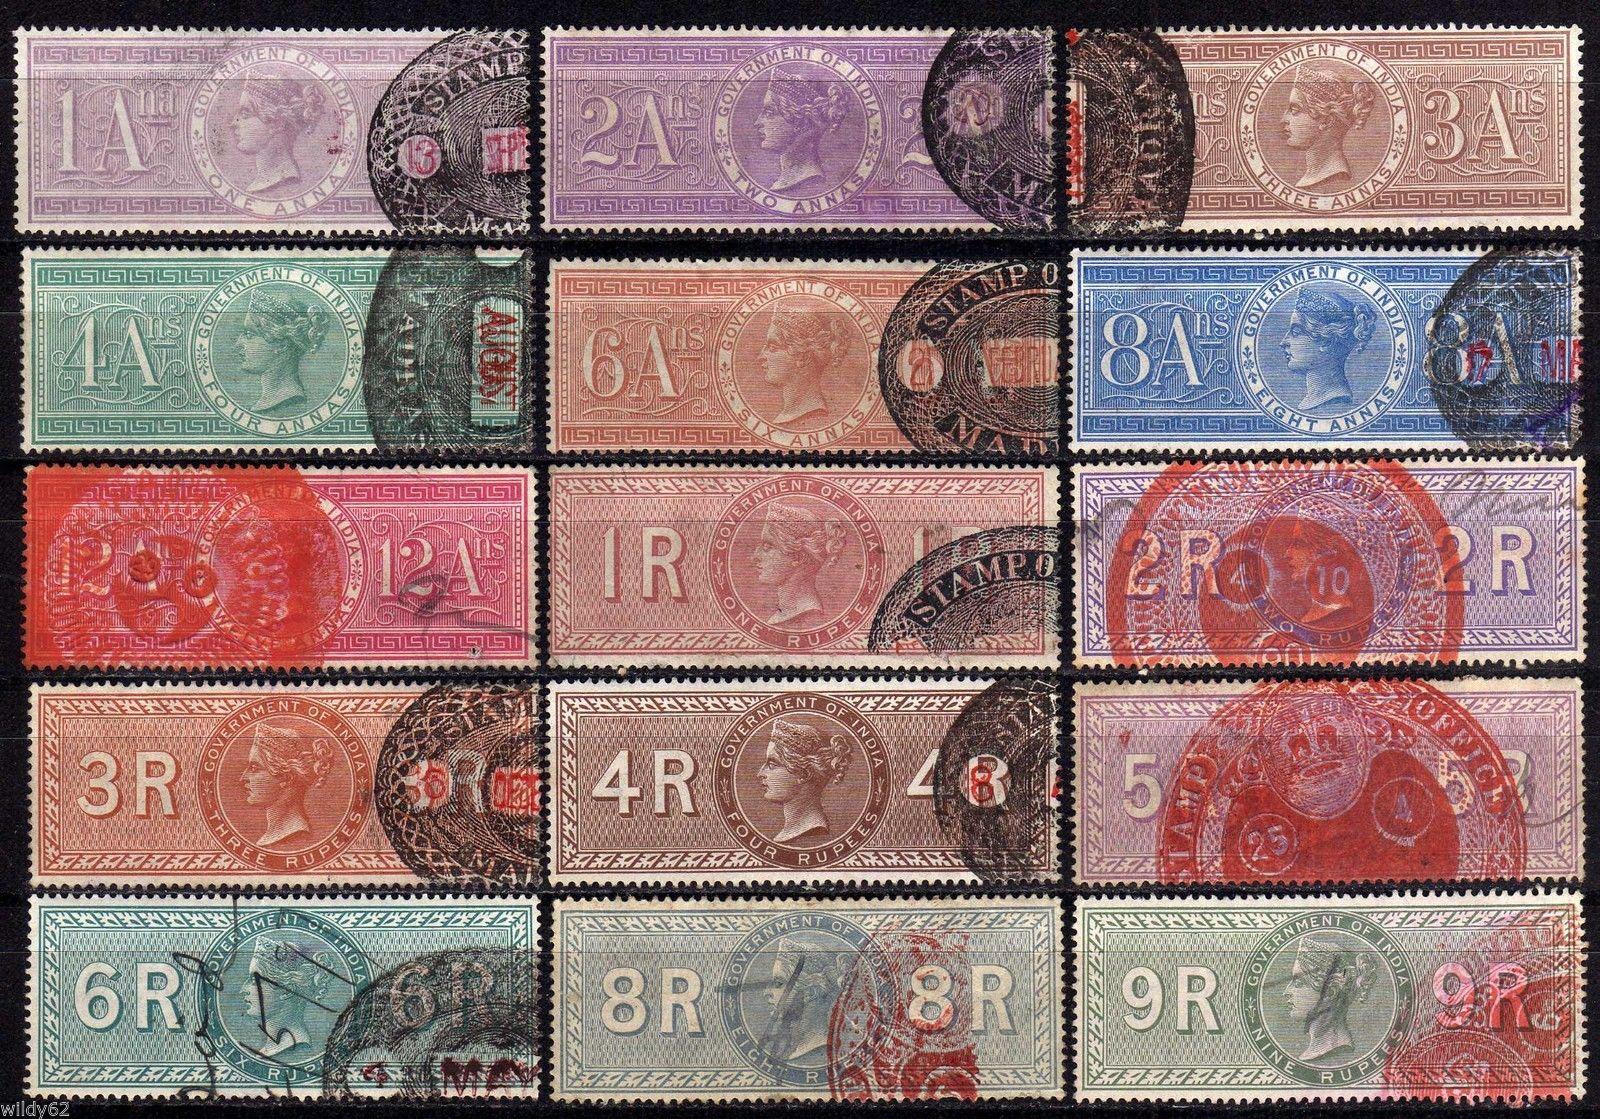 1 rupee revenue stamp in bangalore dating 7